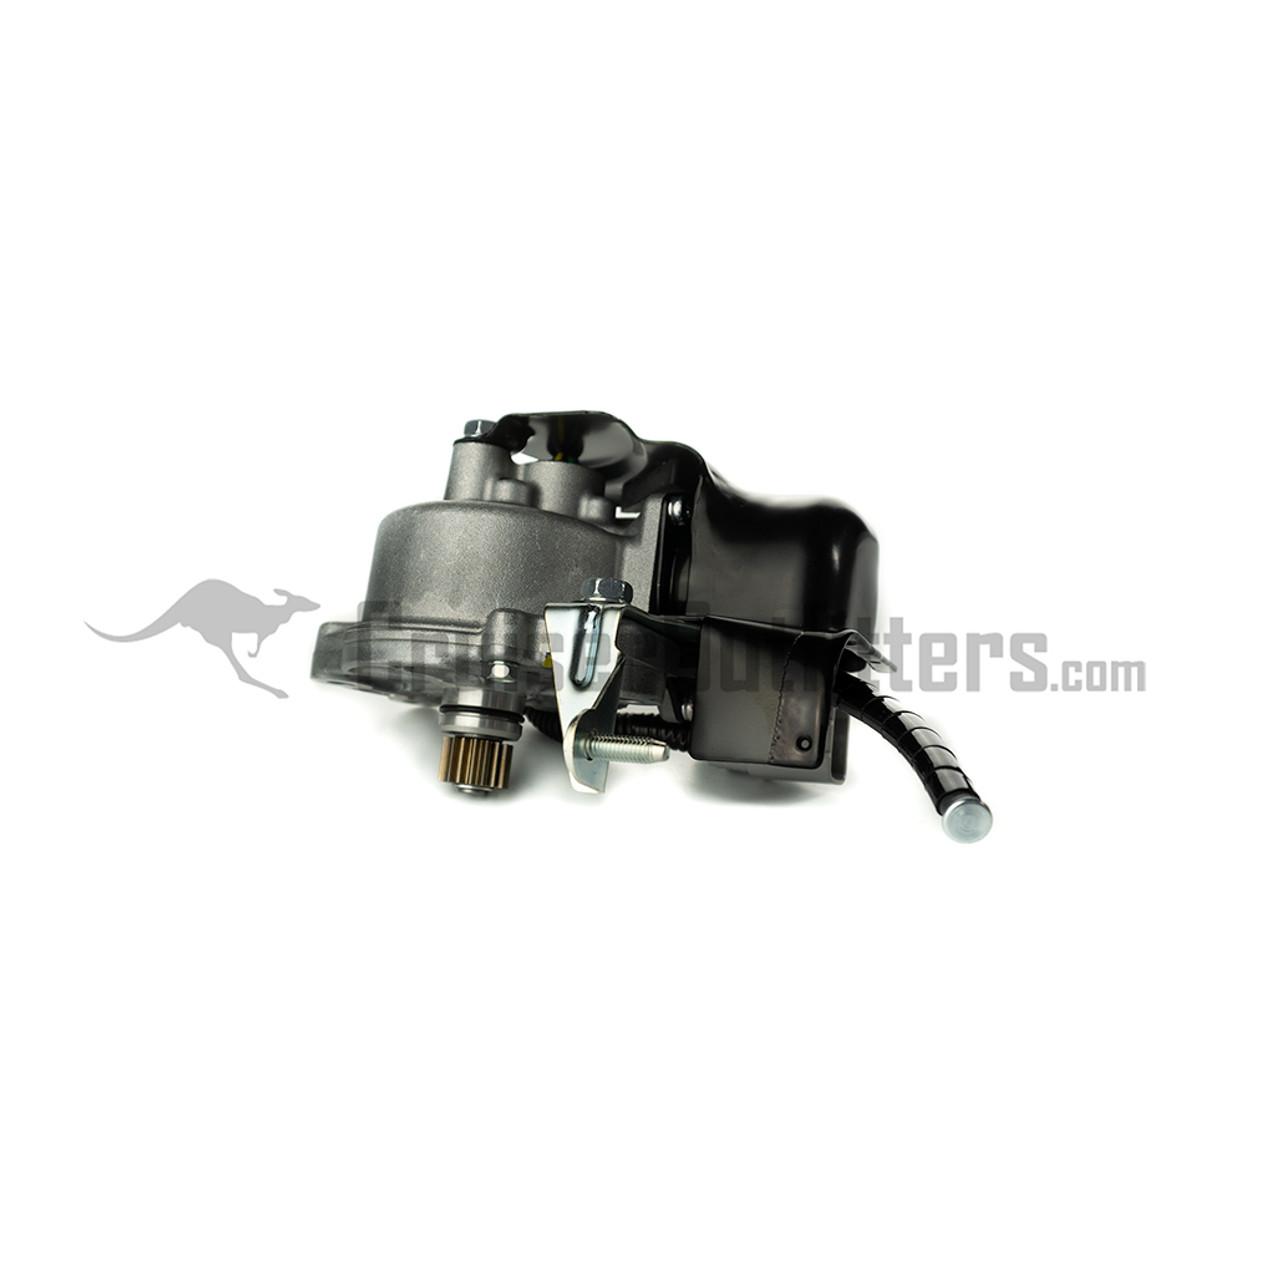 DIFF35031 - AISIN E-Locker Actuator - Fits 96 - 00 & 09 4Rnr & 07/08 FJC